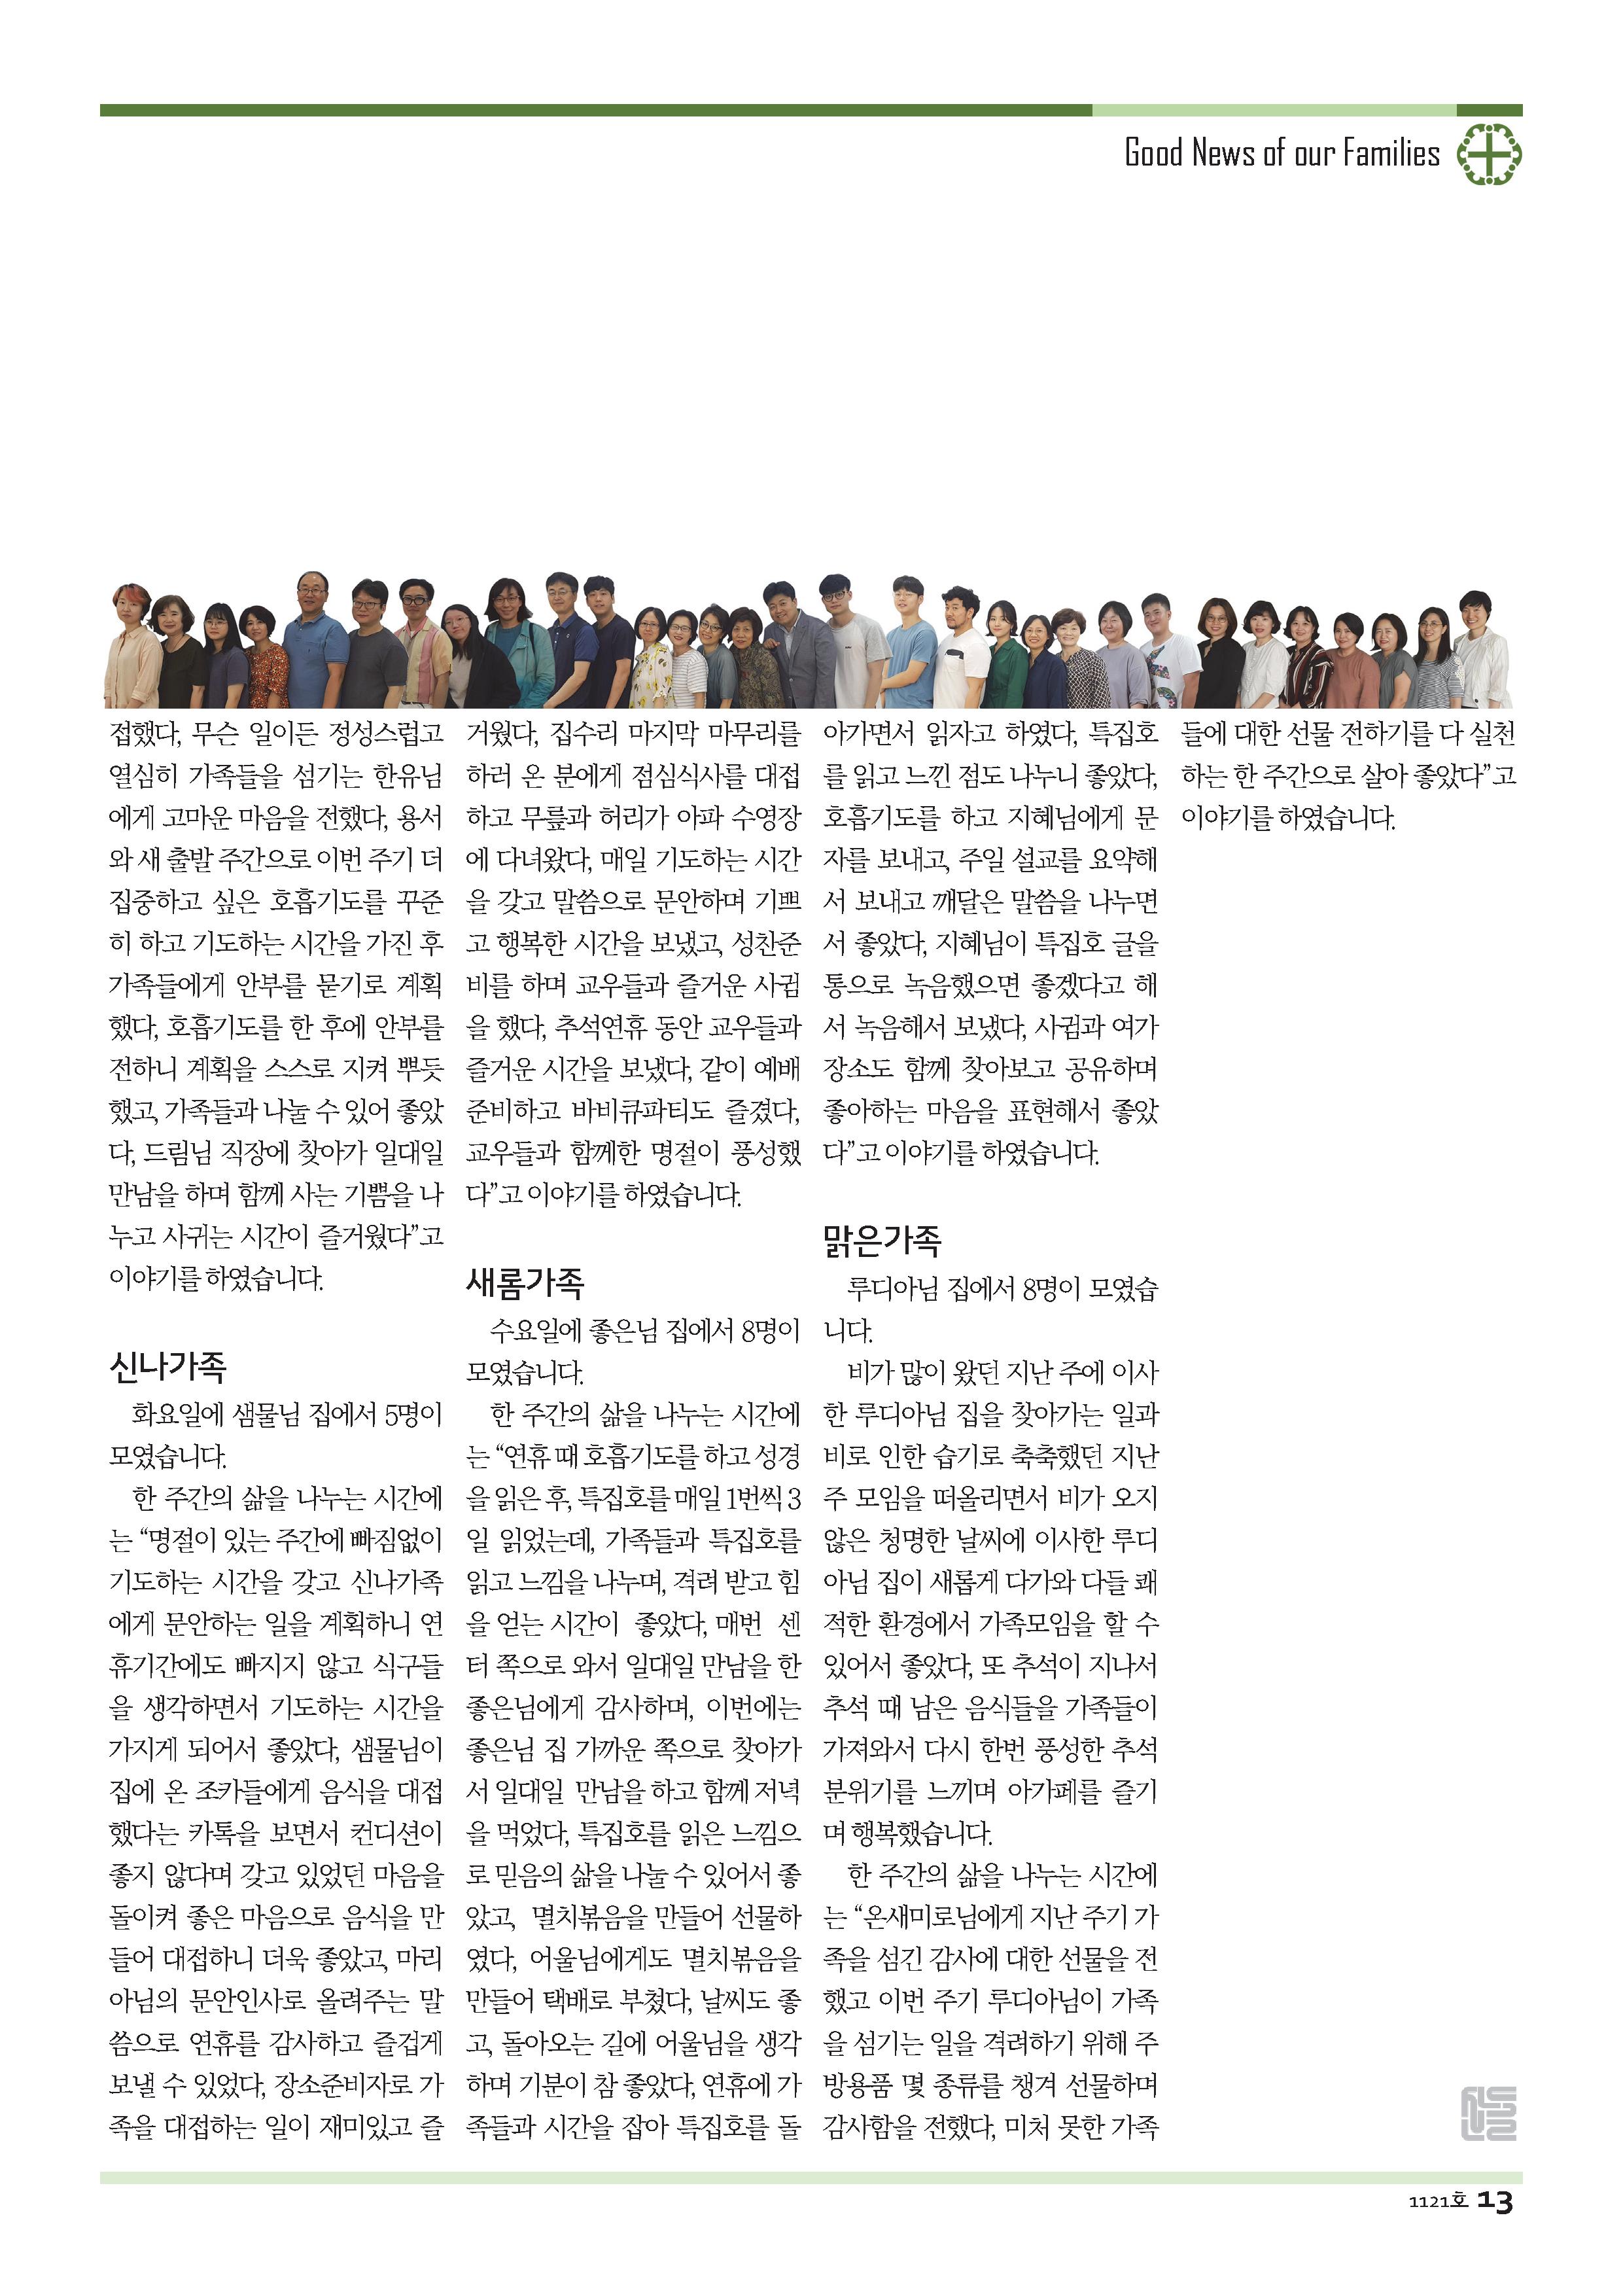 19sdjb0922_페이지_13.png